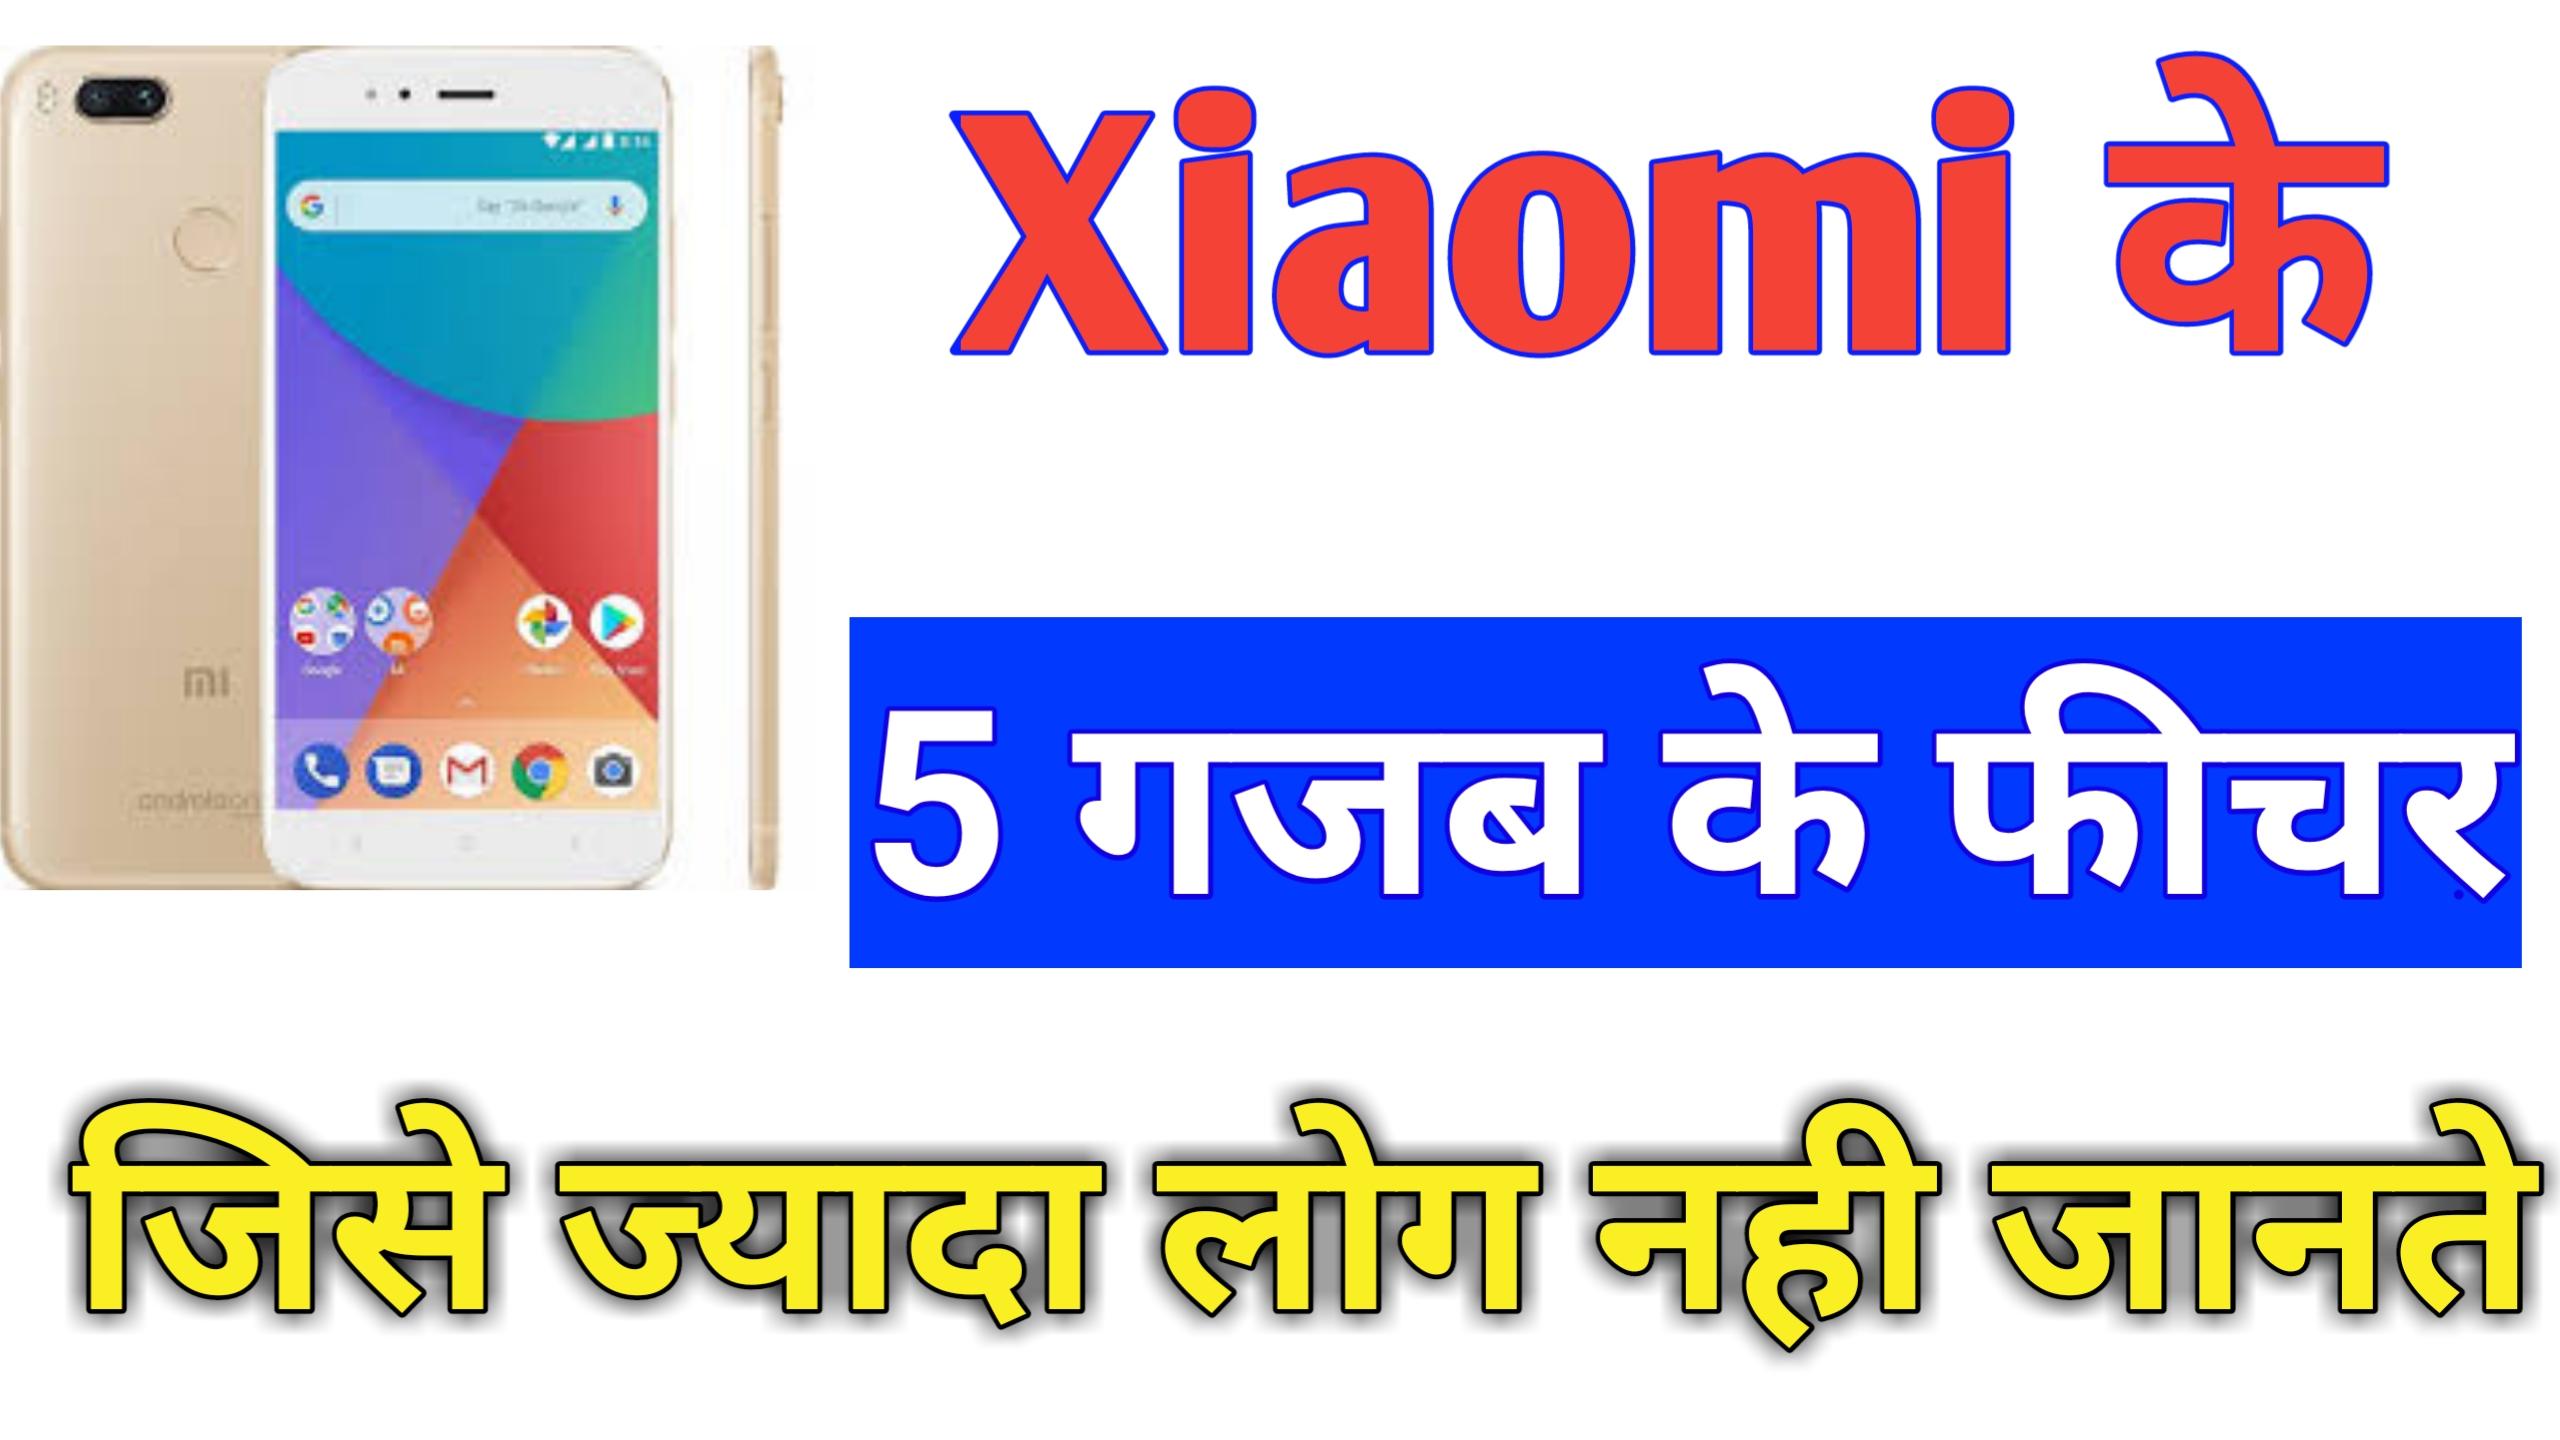 XIAOMI 5 Hidden features । secret Redmi Tip&tricks that you must Know